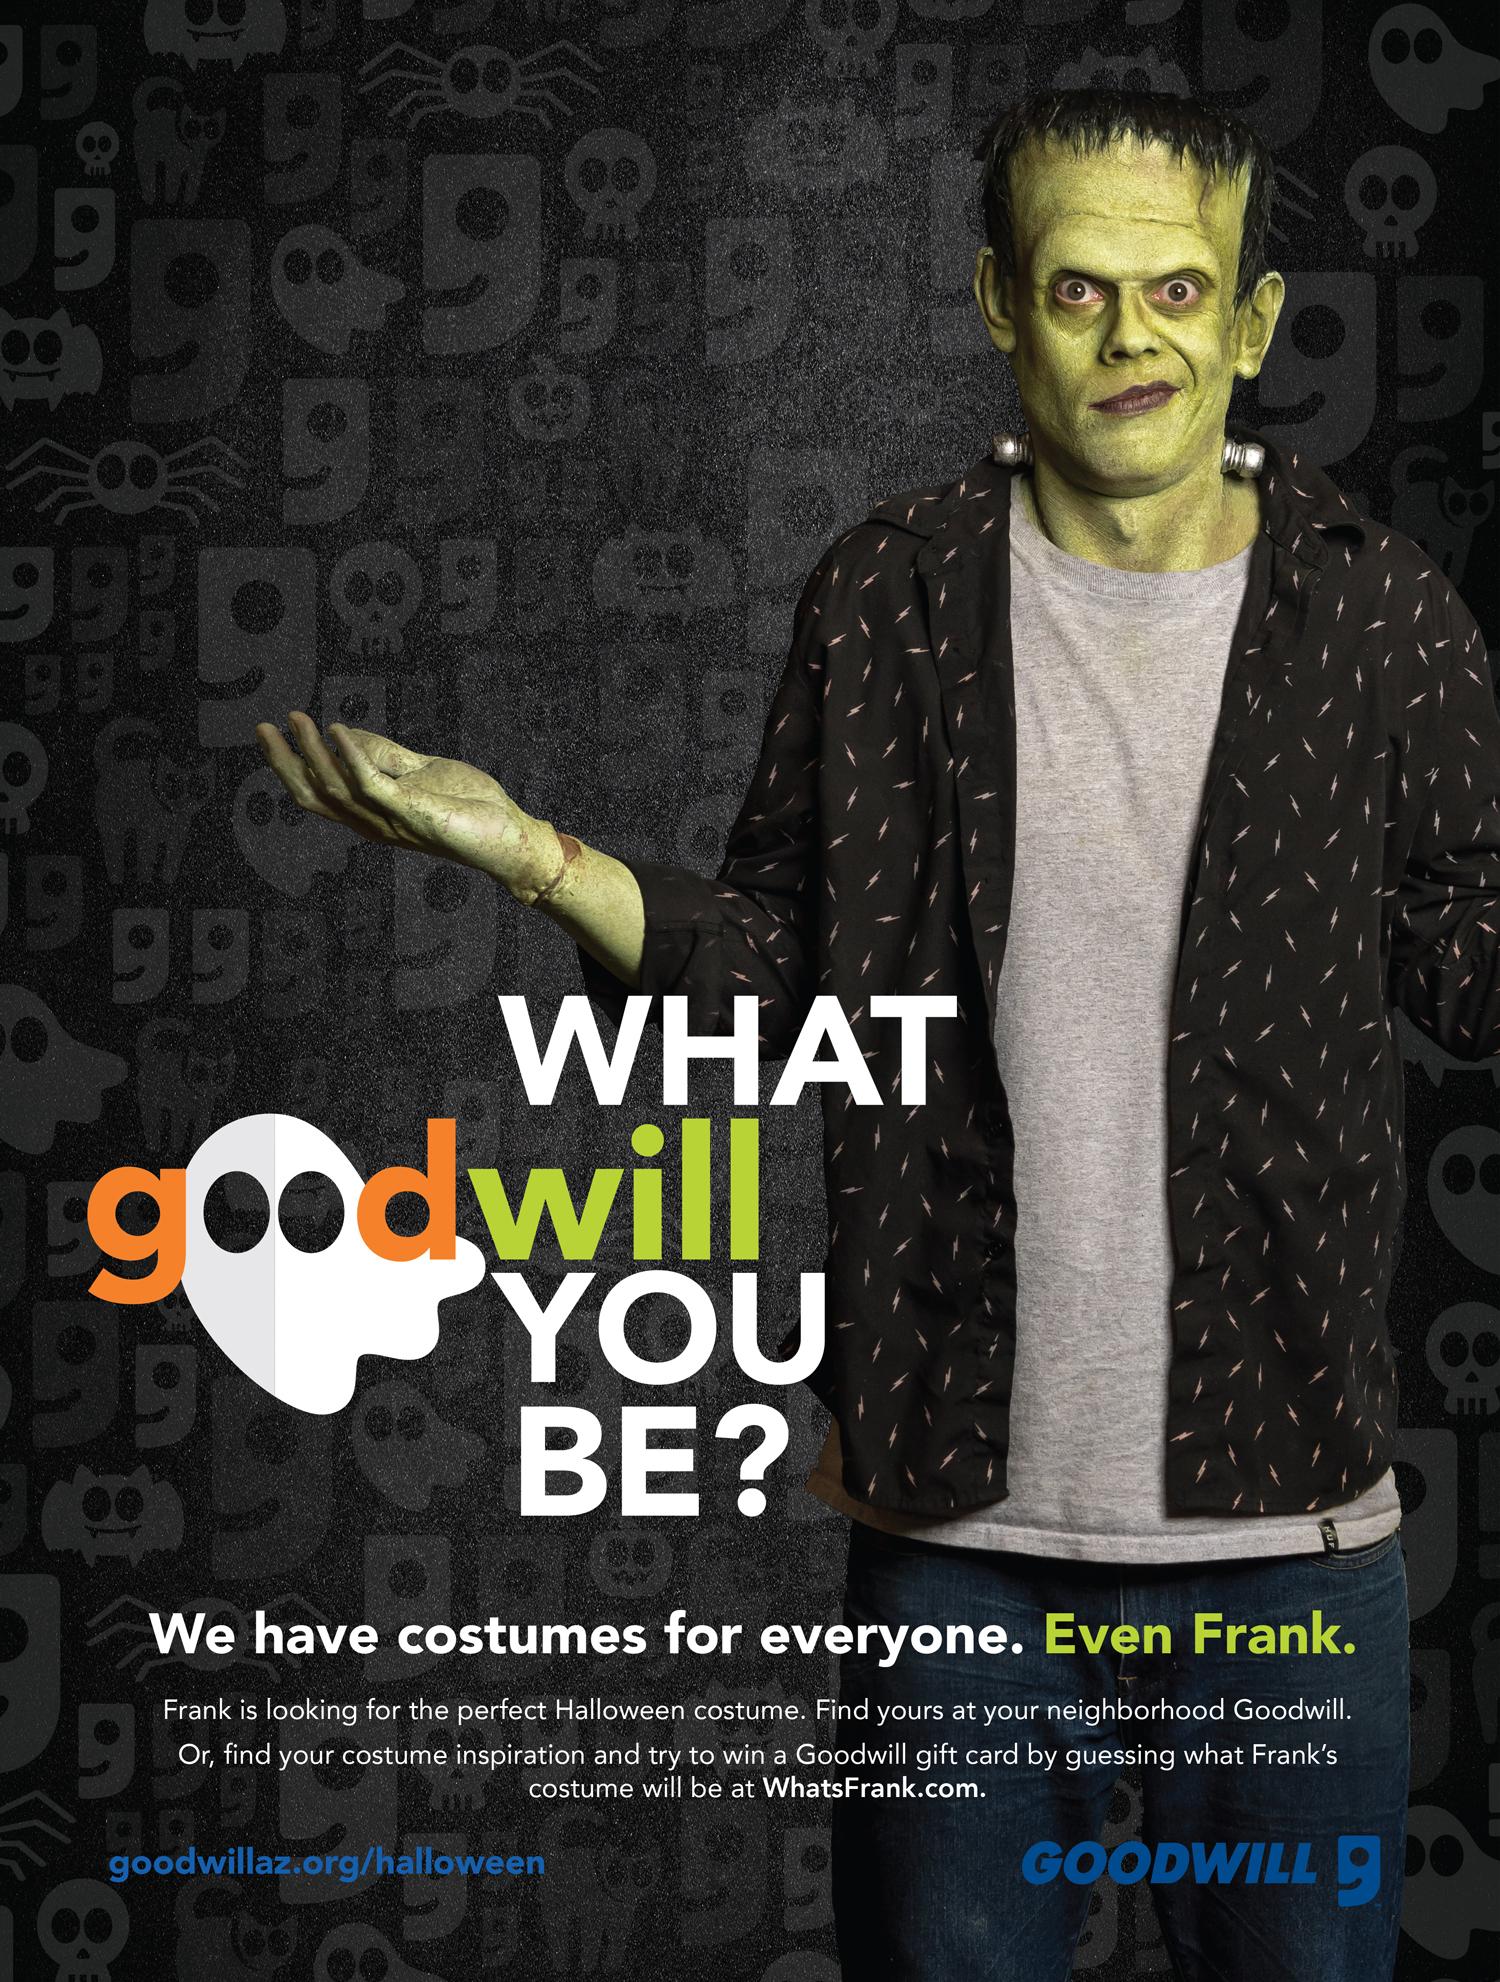 2017-10-05-GW-Halloween-The-Entertainer-FP.jpg